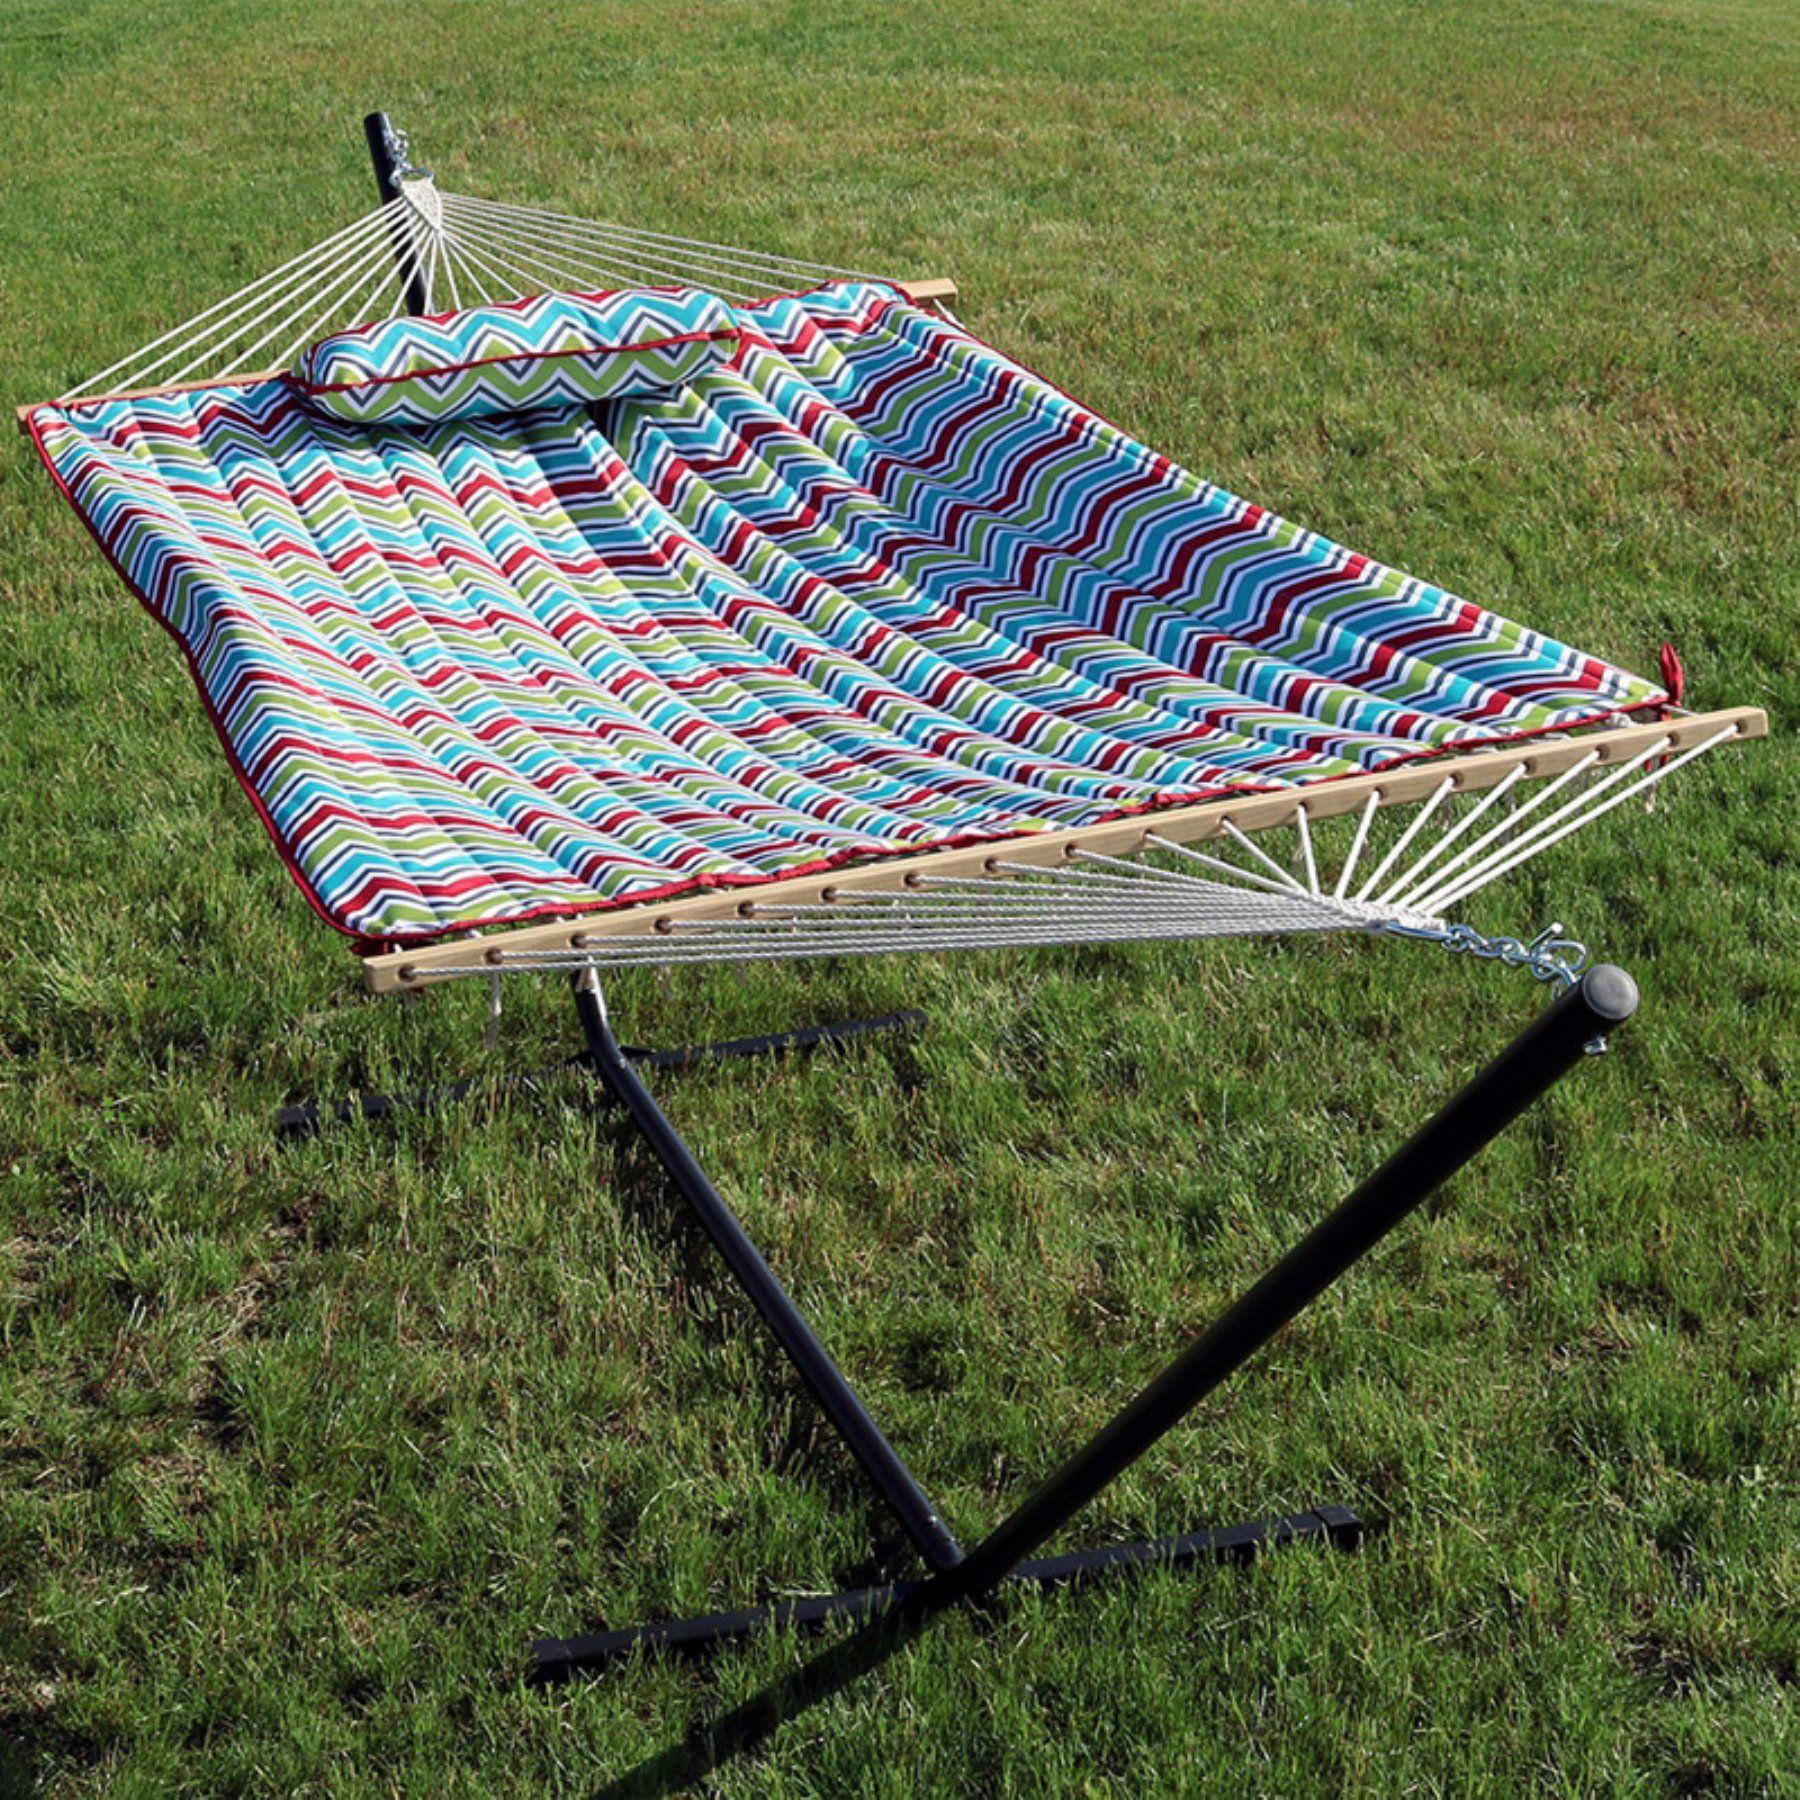 Sunnydaze decor chevron ft rope hammock with steel stand dl